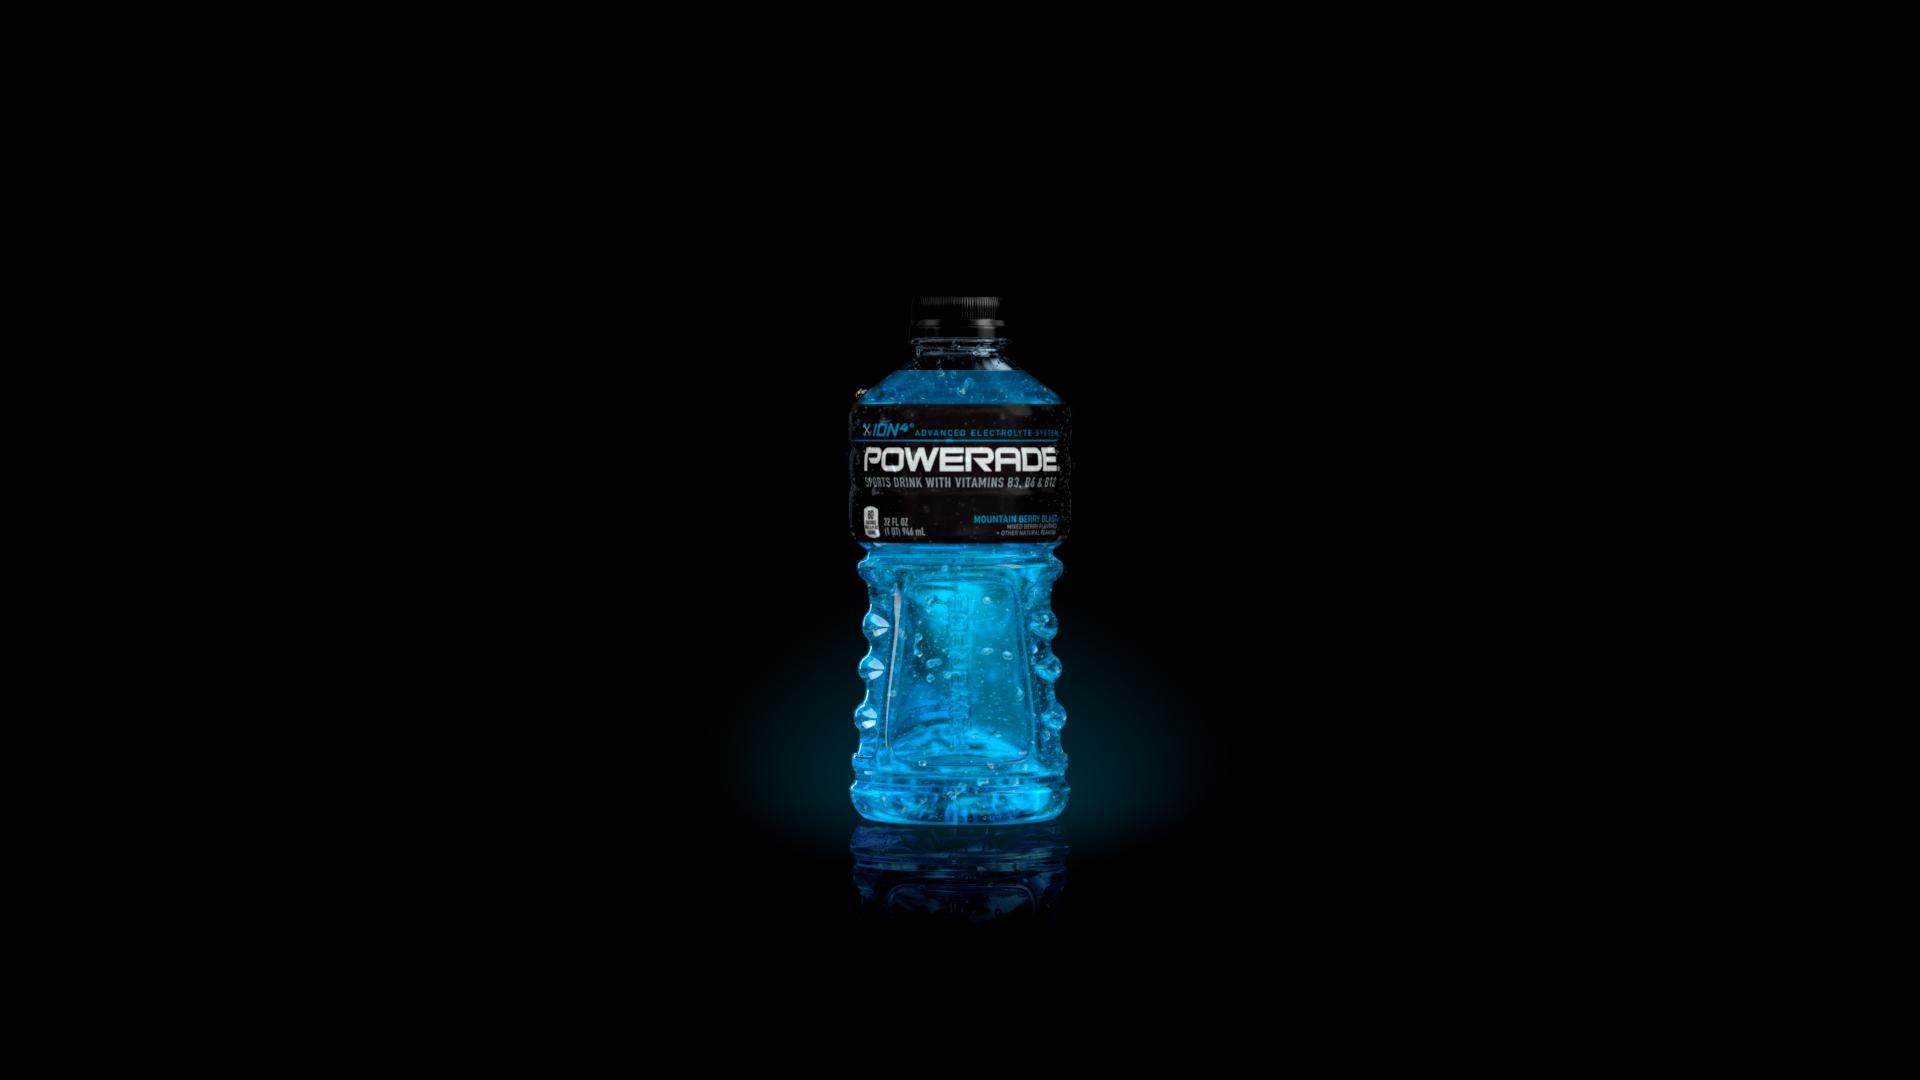 Powerade_32oz_Bottle_056_nk019_FULL_0001.png